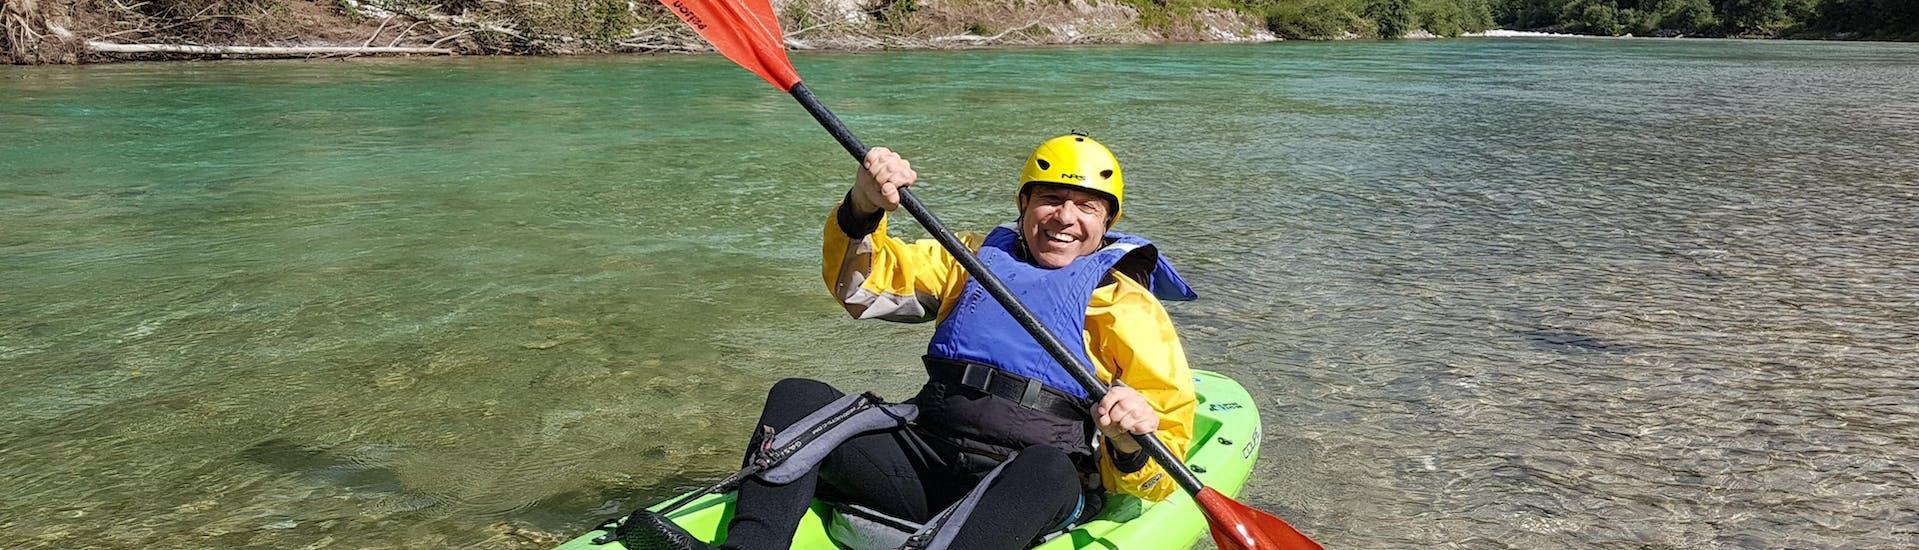 canoe---soca-a2-rafting-hero